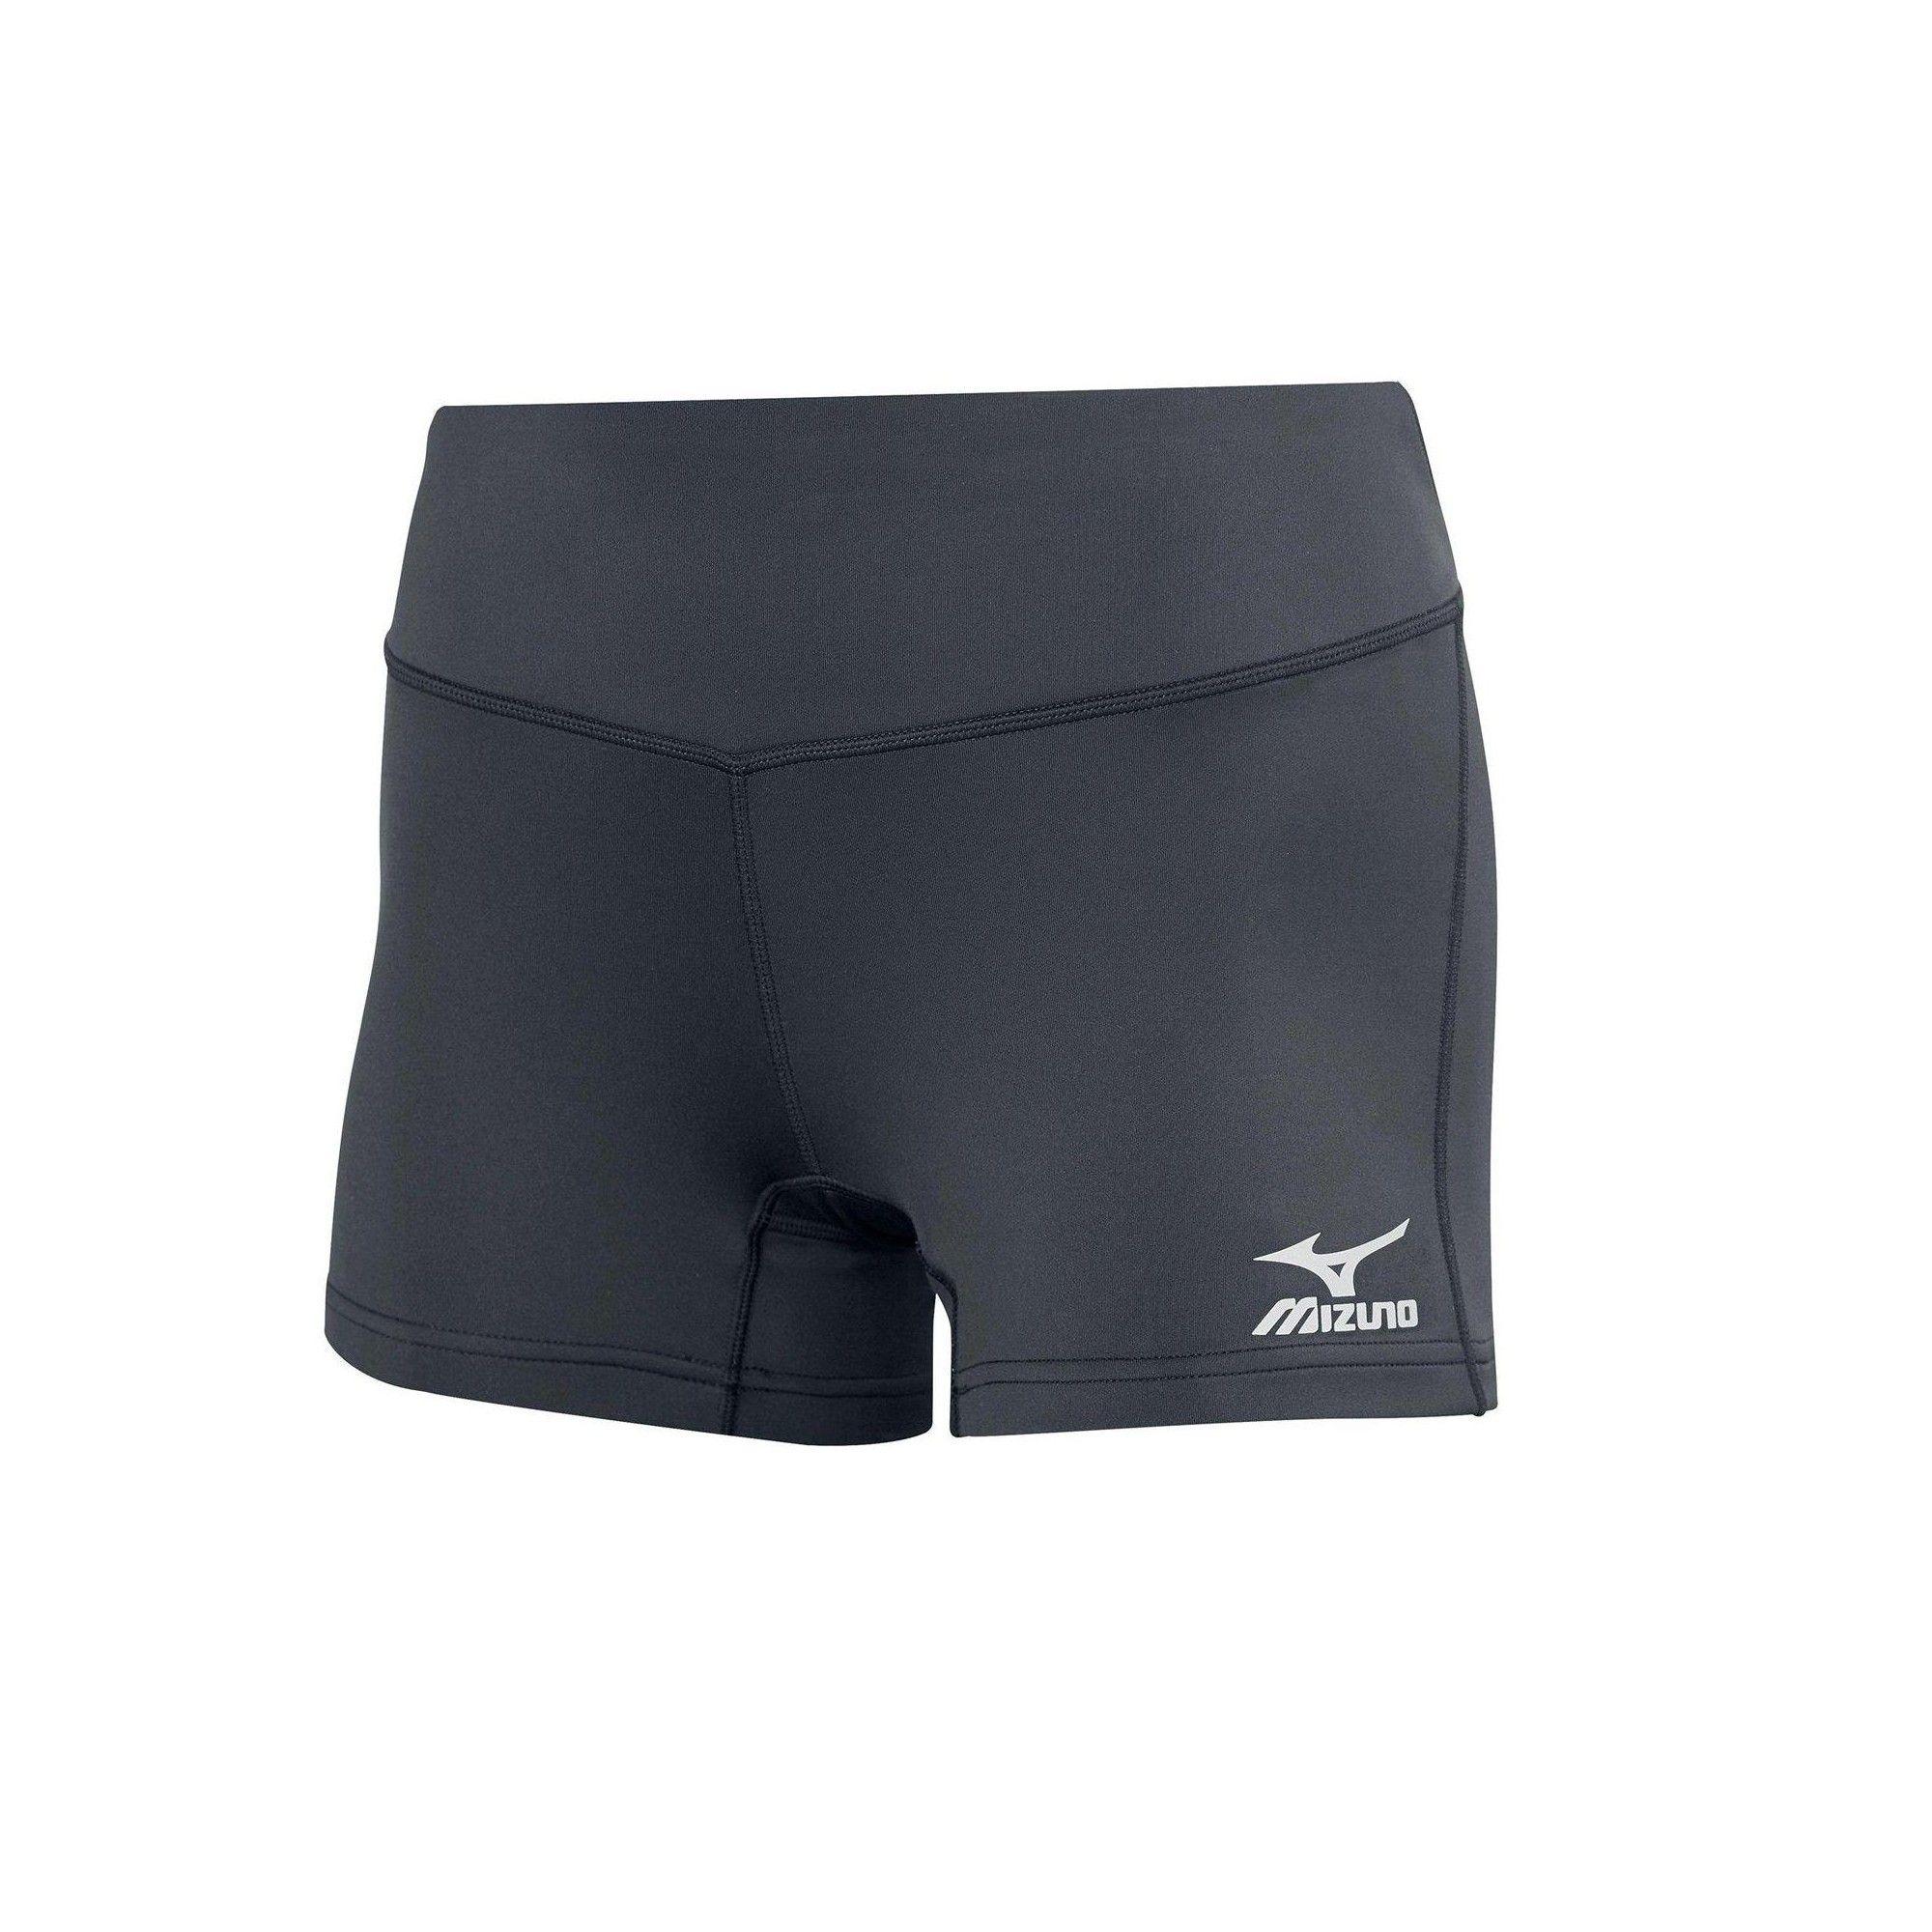 mizuno volleyball shorts womens 2018